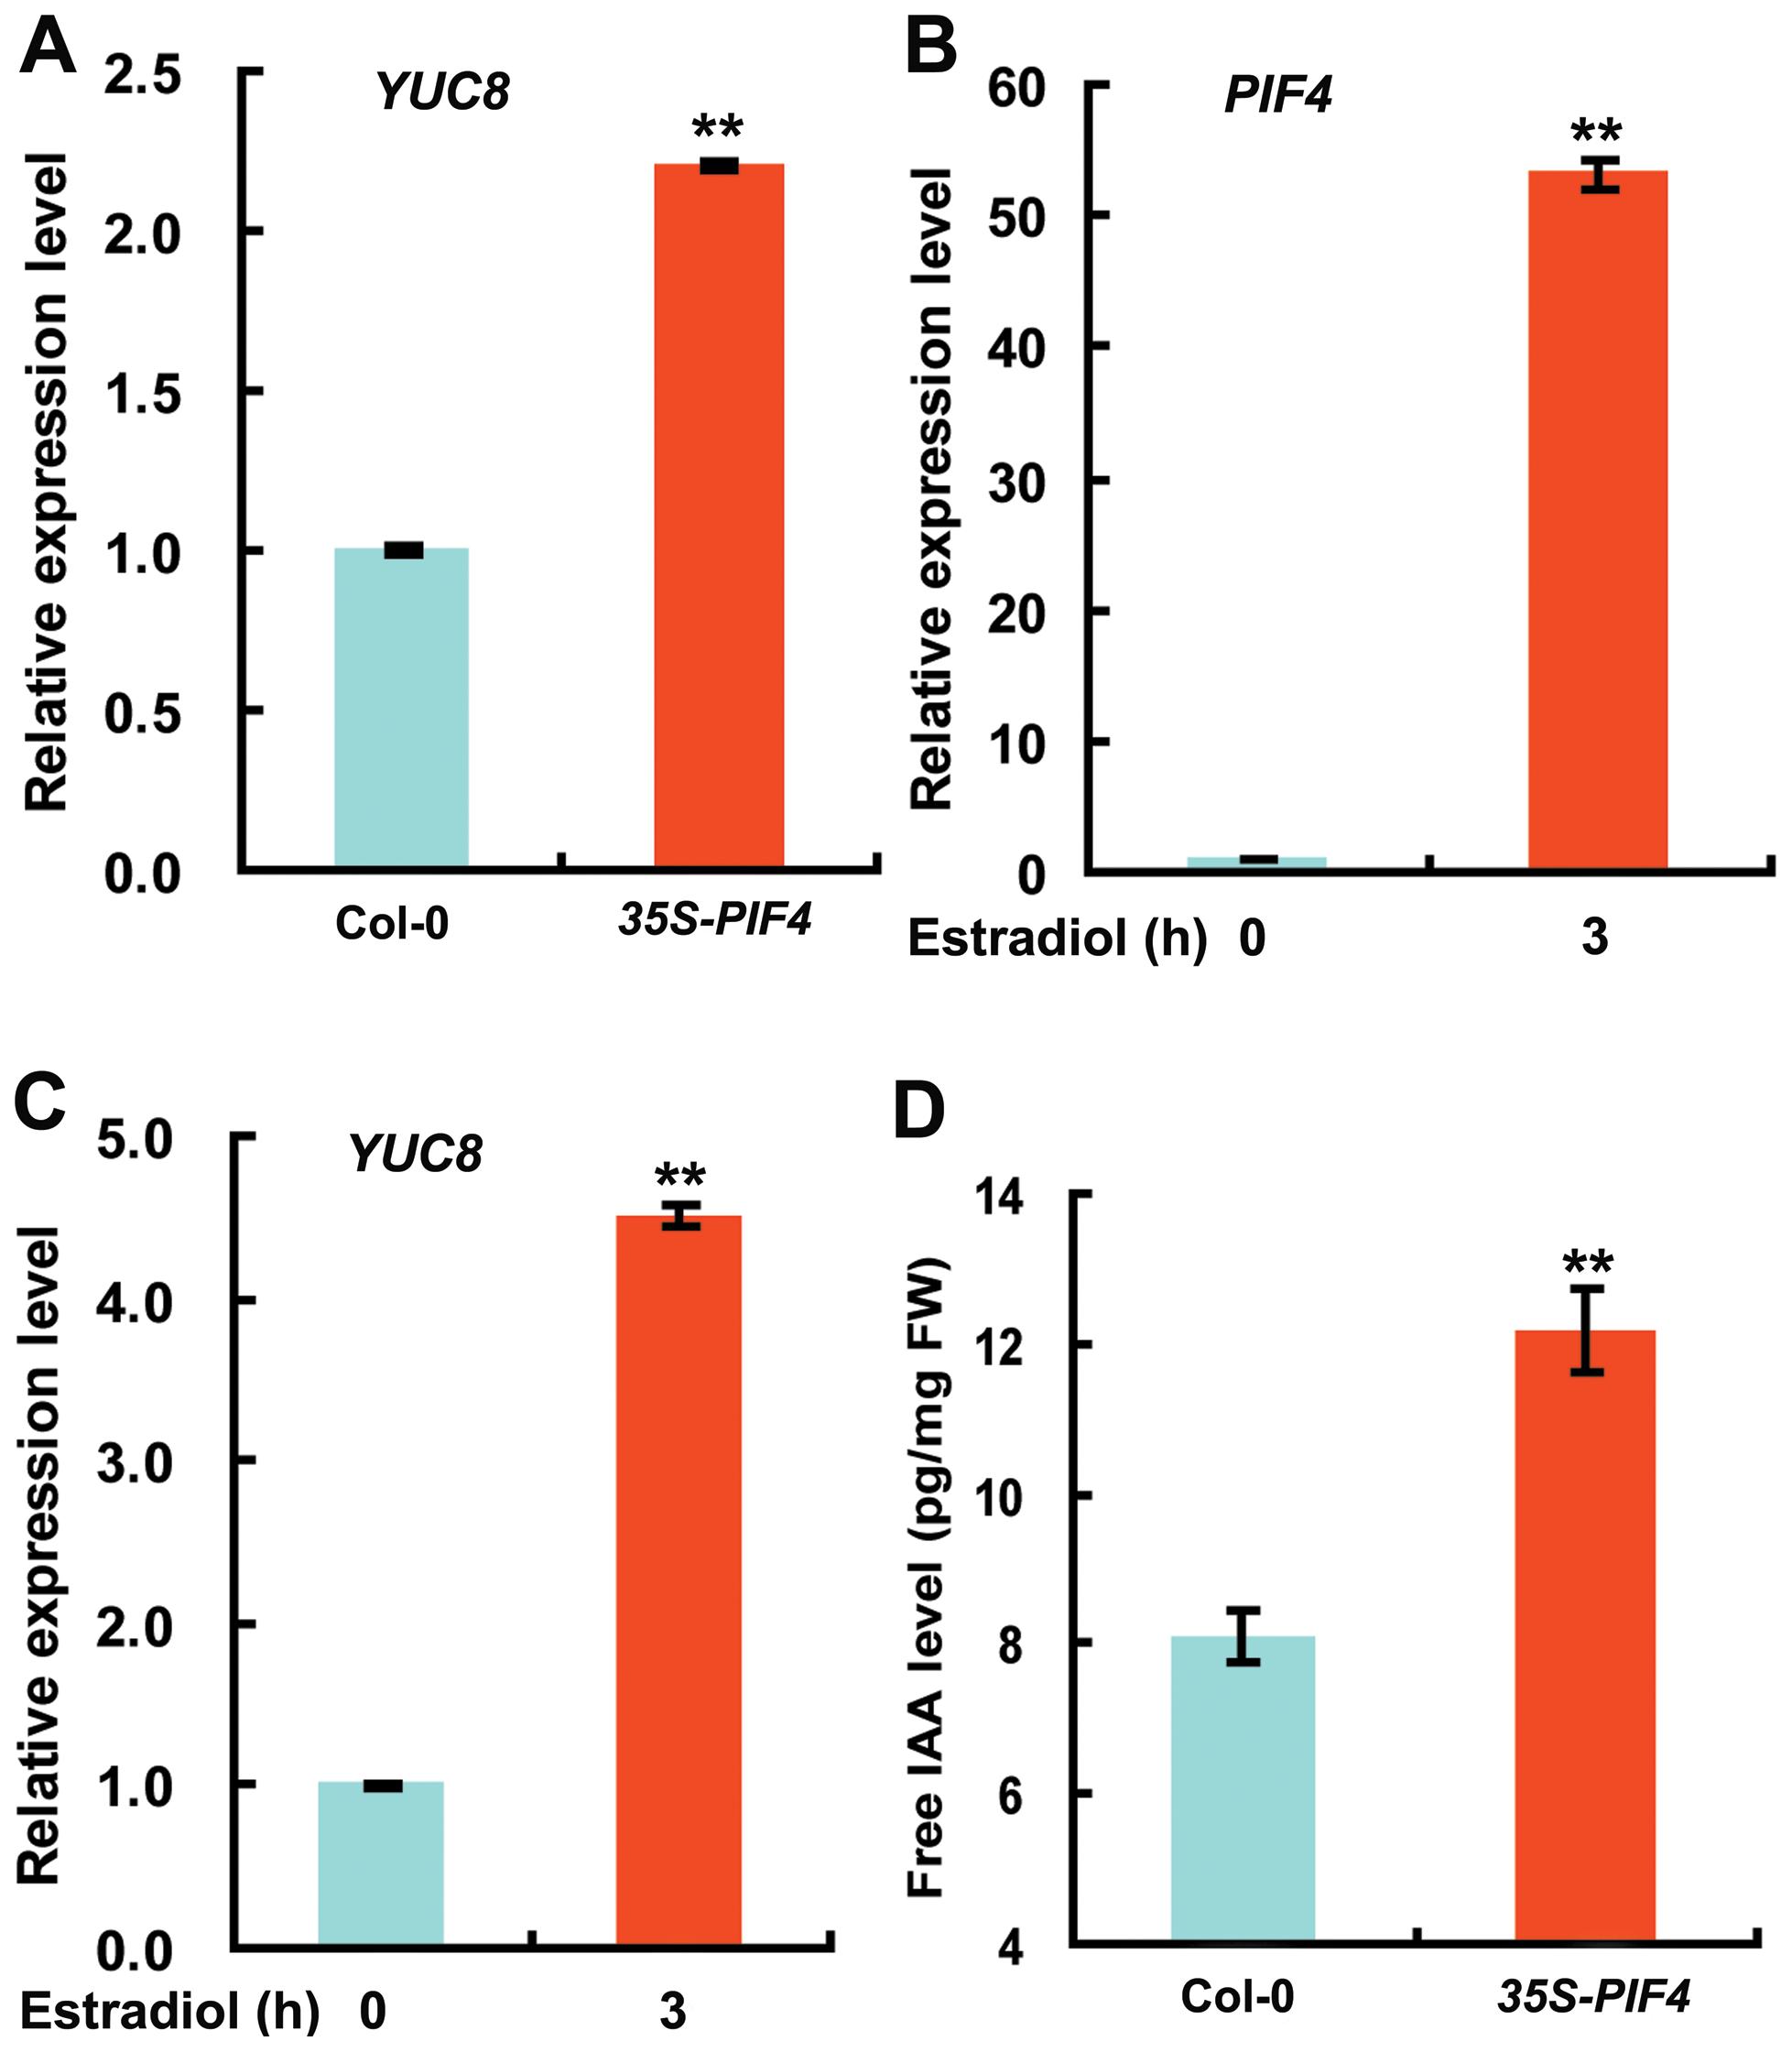 Overexpression of <i>PIF4</i> Increases the Expression of <i>YUC8</i> and Elevates Endogenous Free IAA Levels.